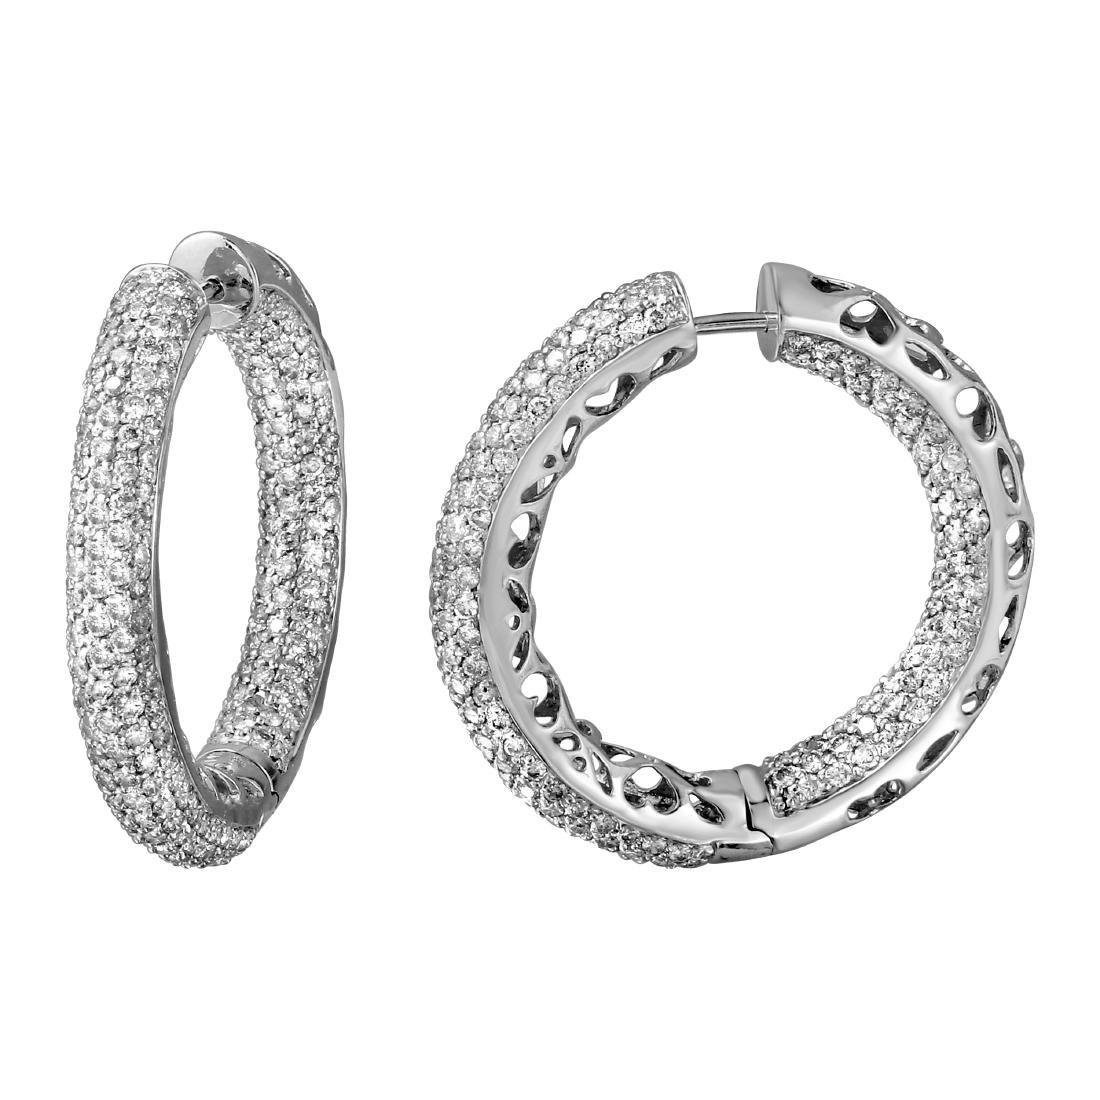 Genuine 5.7 TCW 14K White Gold Ladies Earring